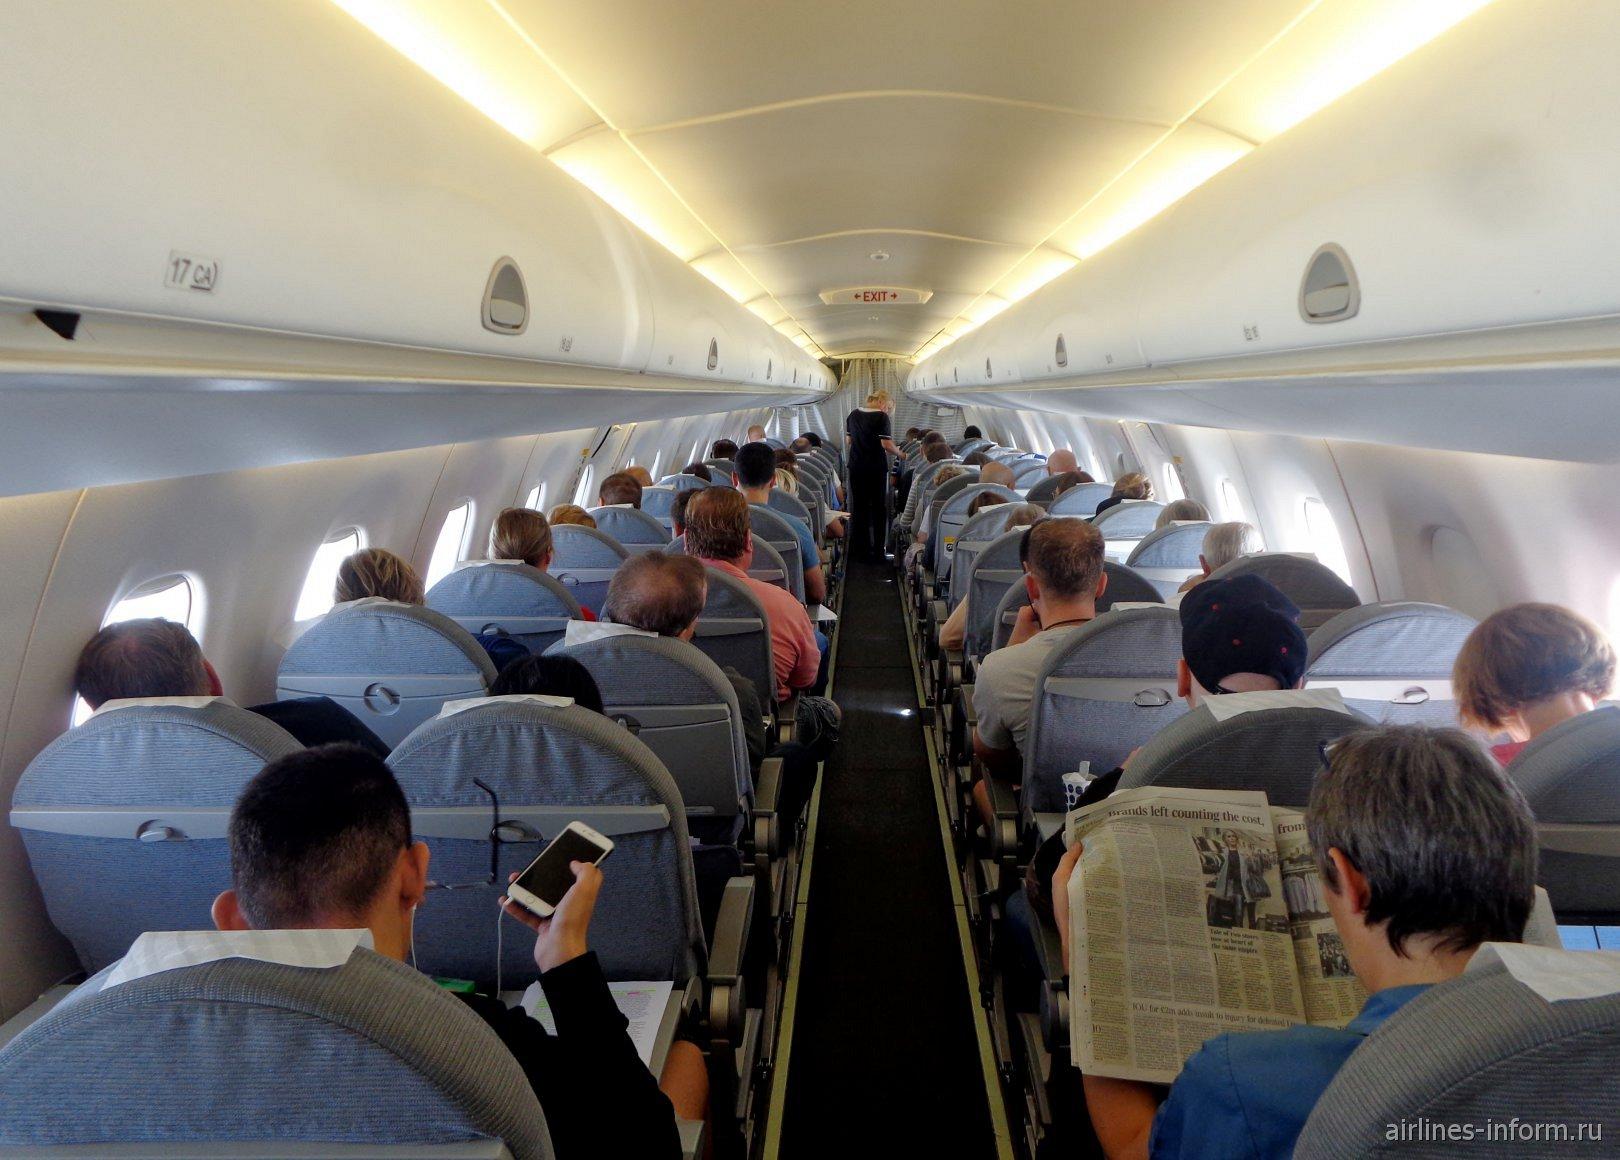 Пассажирский салон самолета Embraer 190 авиакомпании Finnair